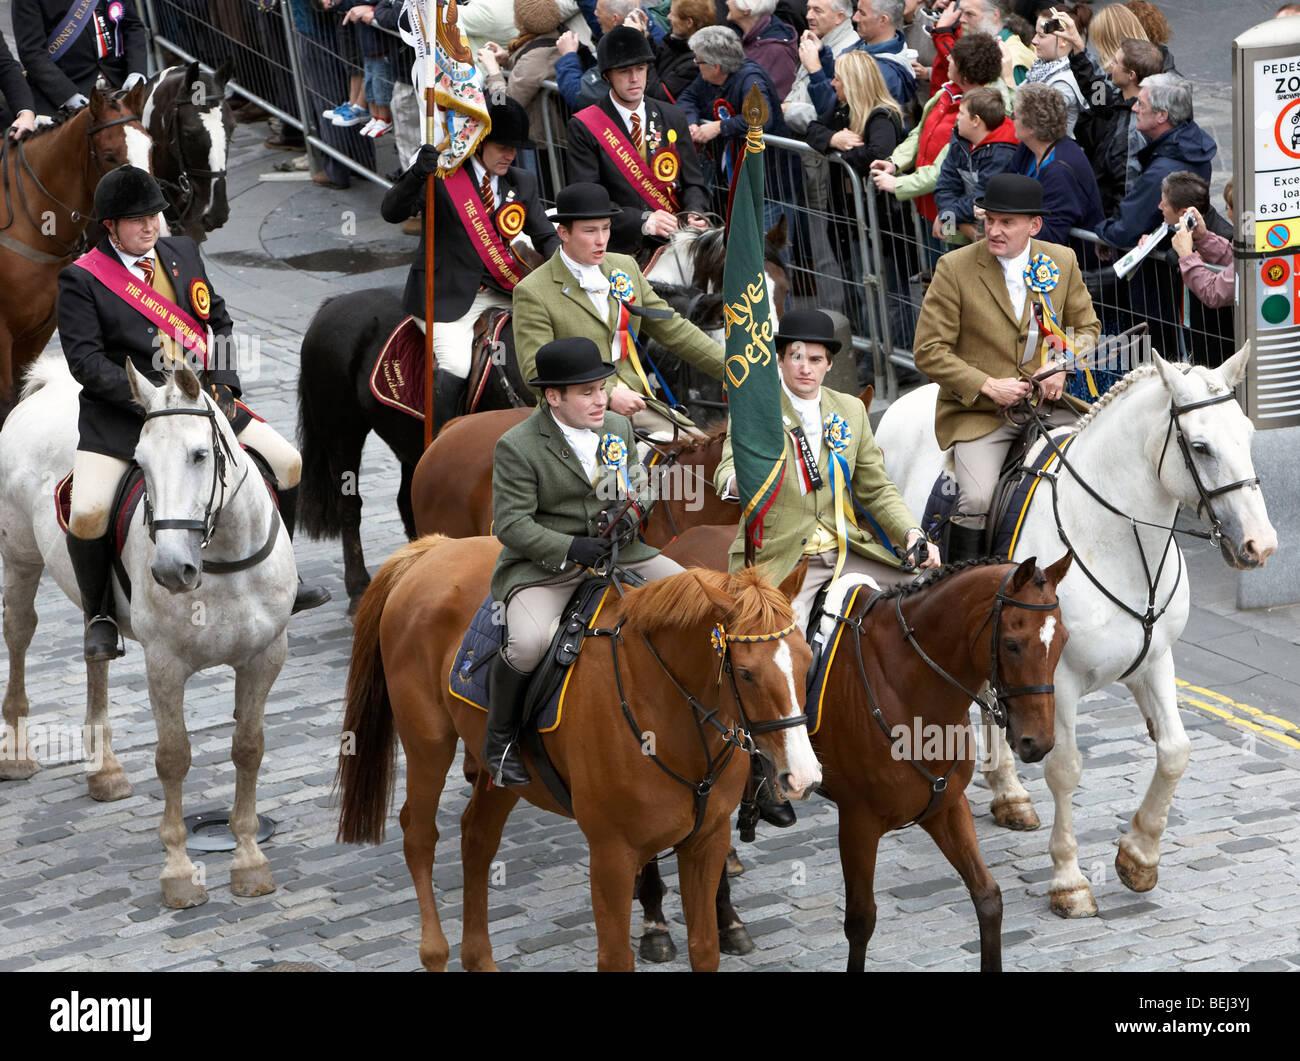 The Riding Of The Marches Edinburgh 2009 Scotland UK - Stock Image